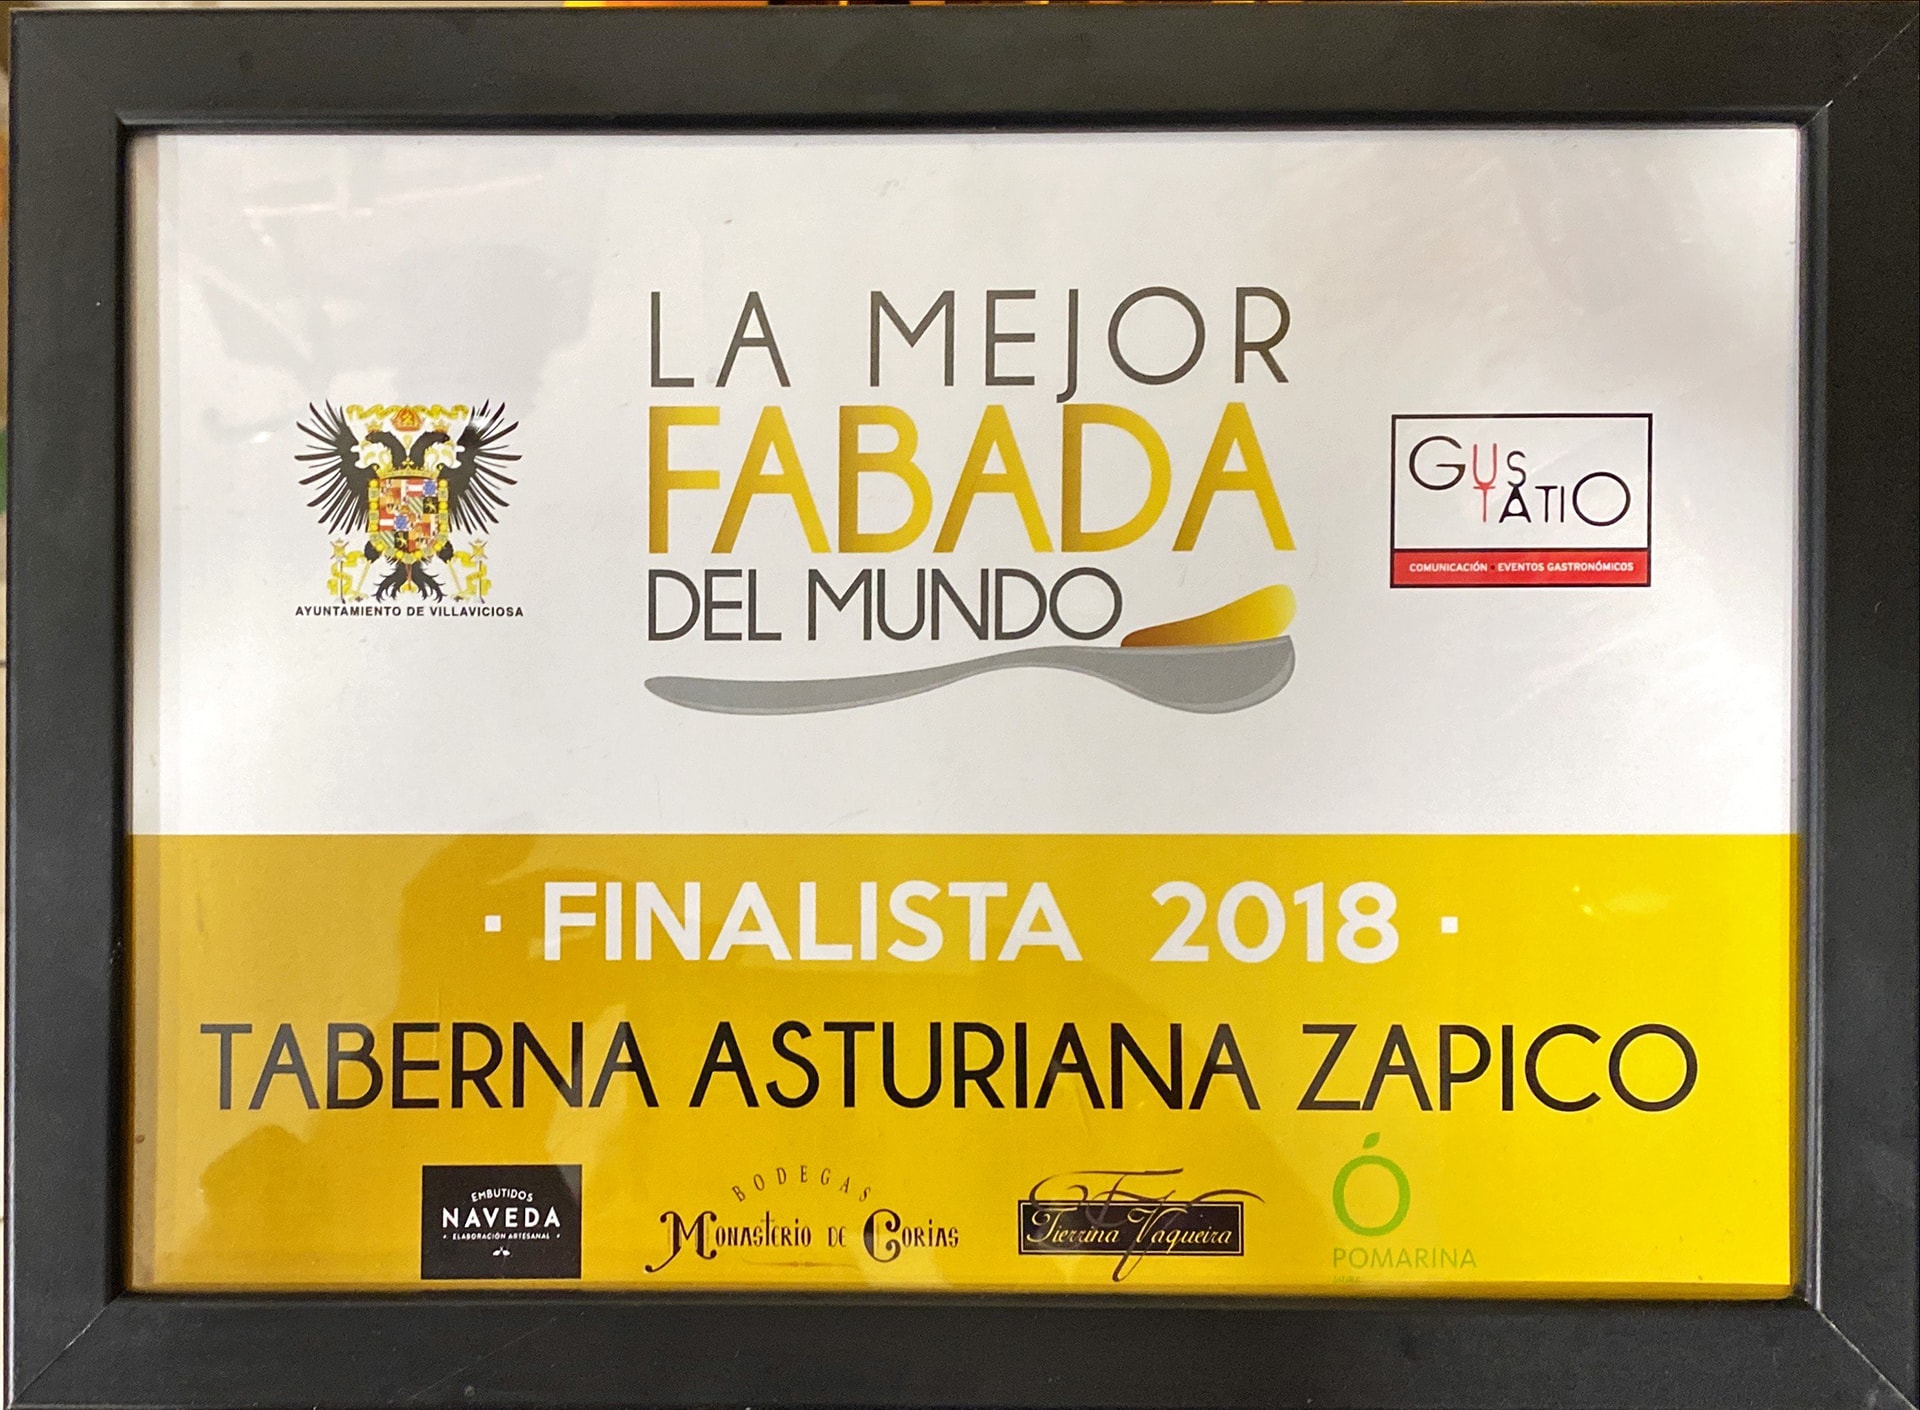 Finalista 2018 Mejor Fabada del Mundo Taberna Asturiana Zapico